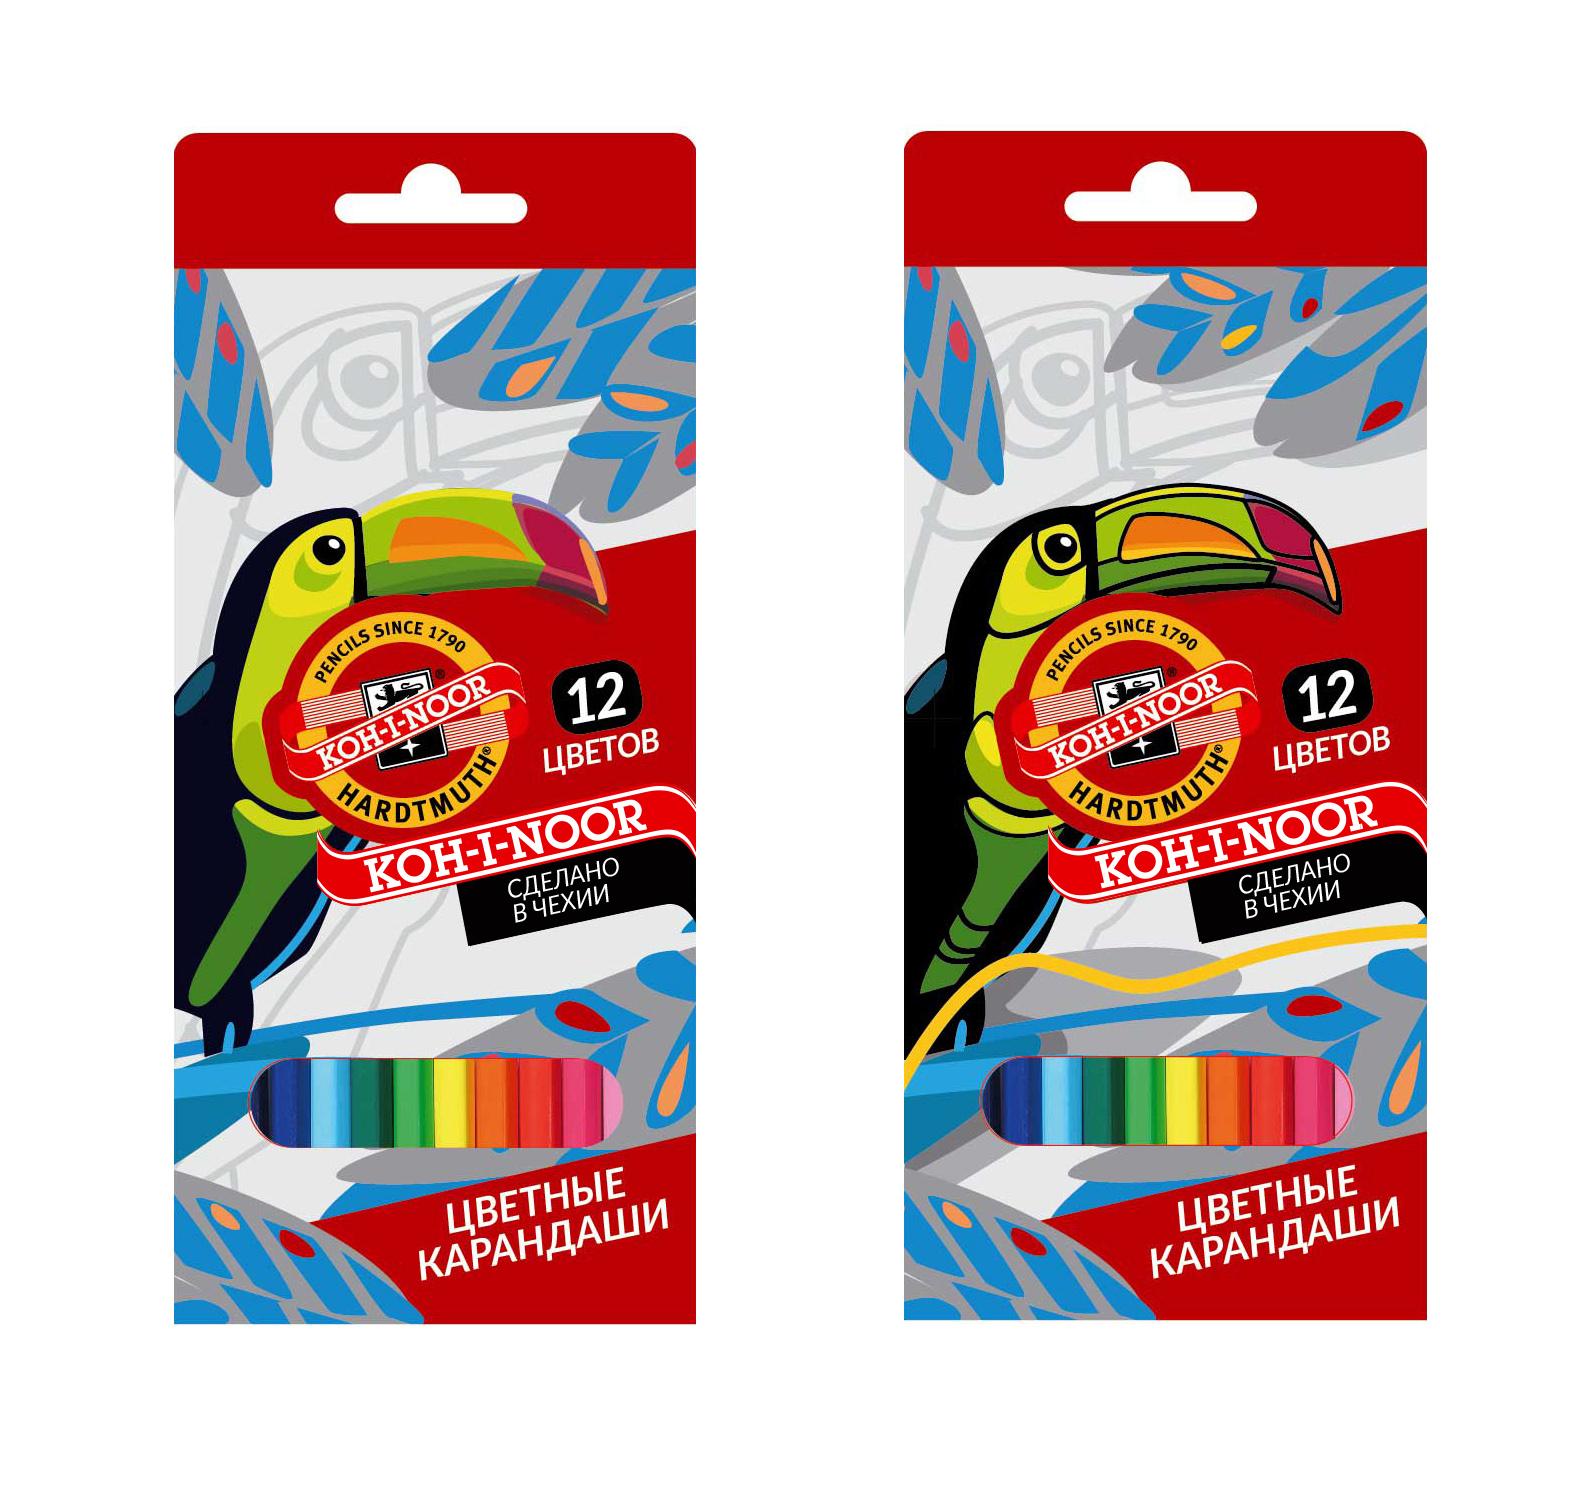 Разработка дизайна упаковки для чешского бренда KOH-I-NOOR фото f_69859f0f52c16a2c.jpg